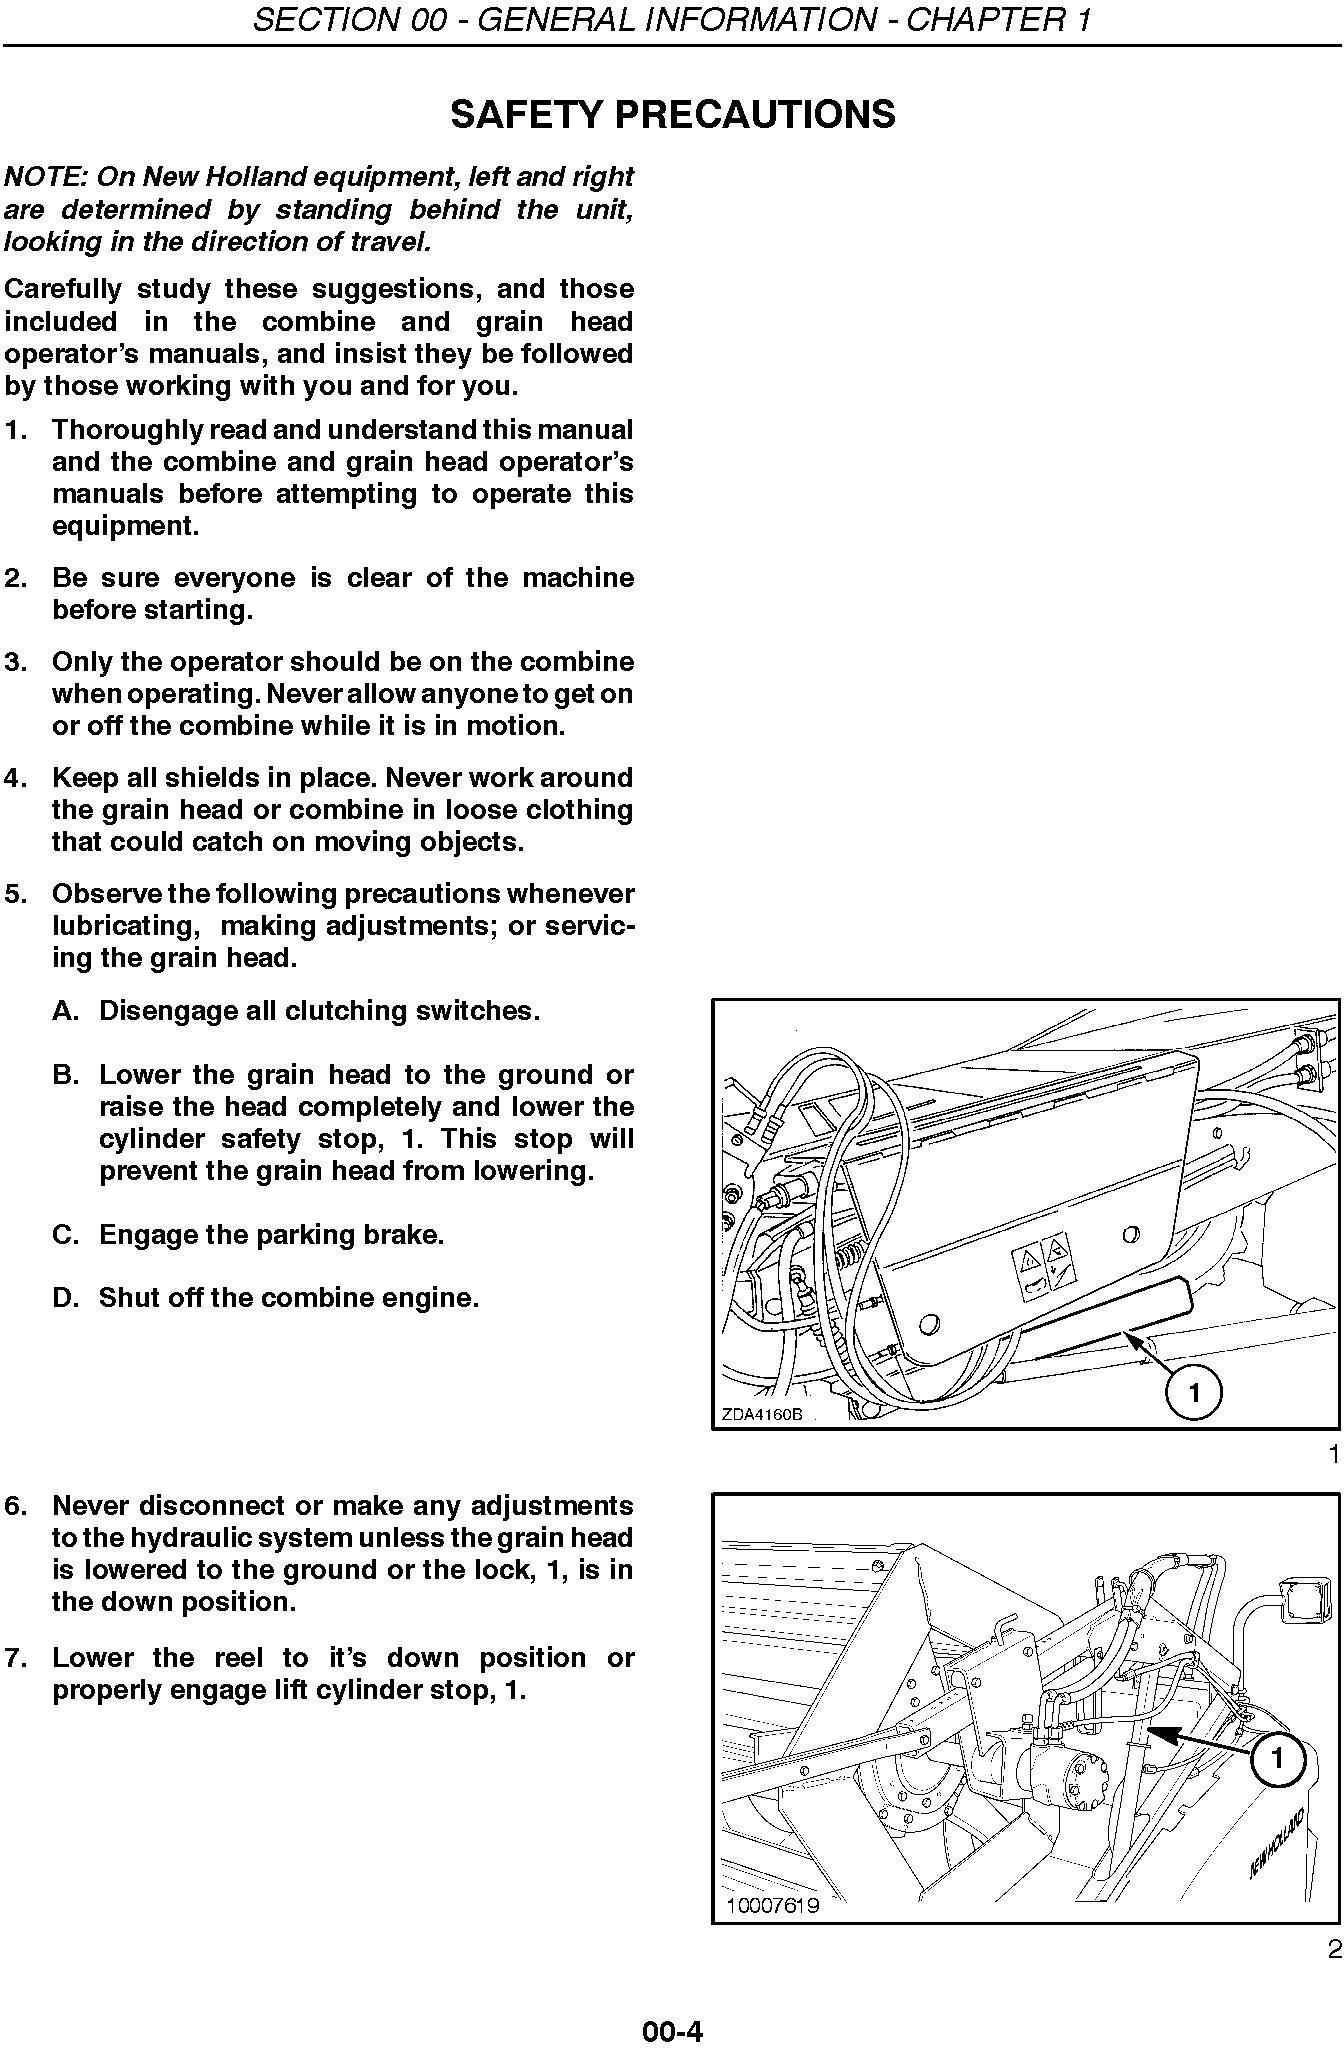 New Holland 72c, 74c Grain Head Service Manual - 1